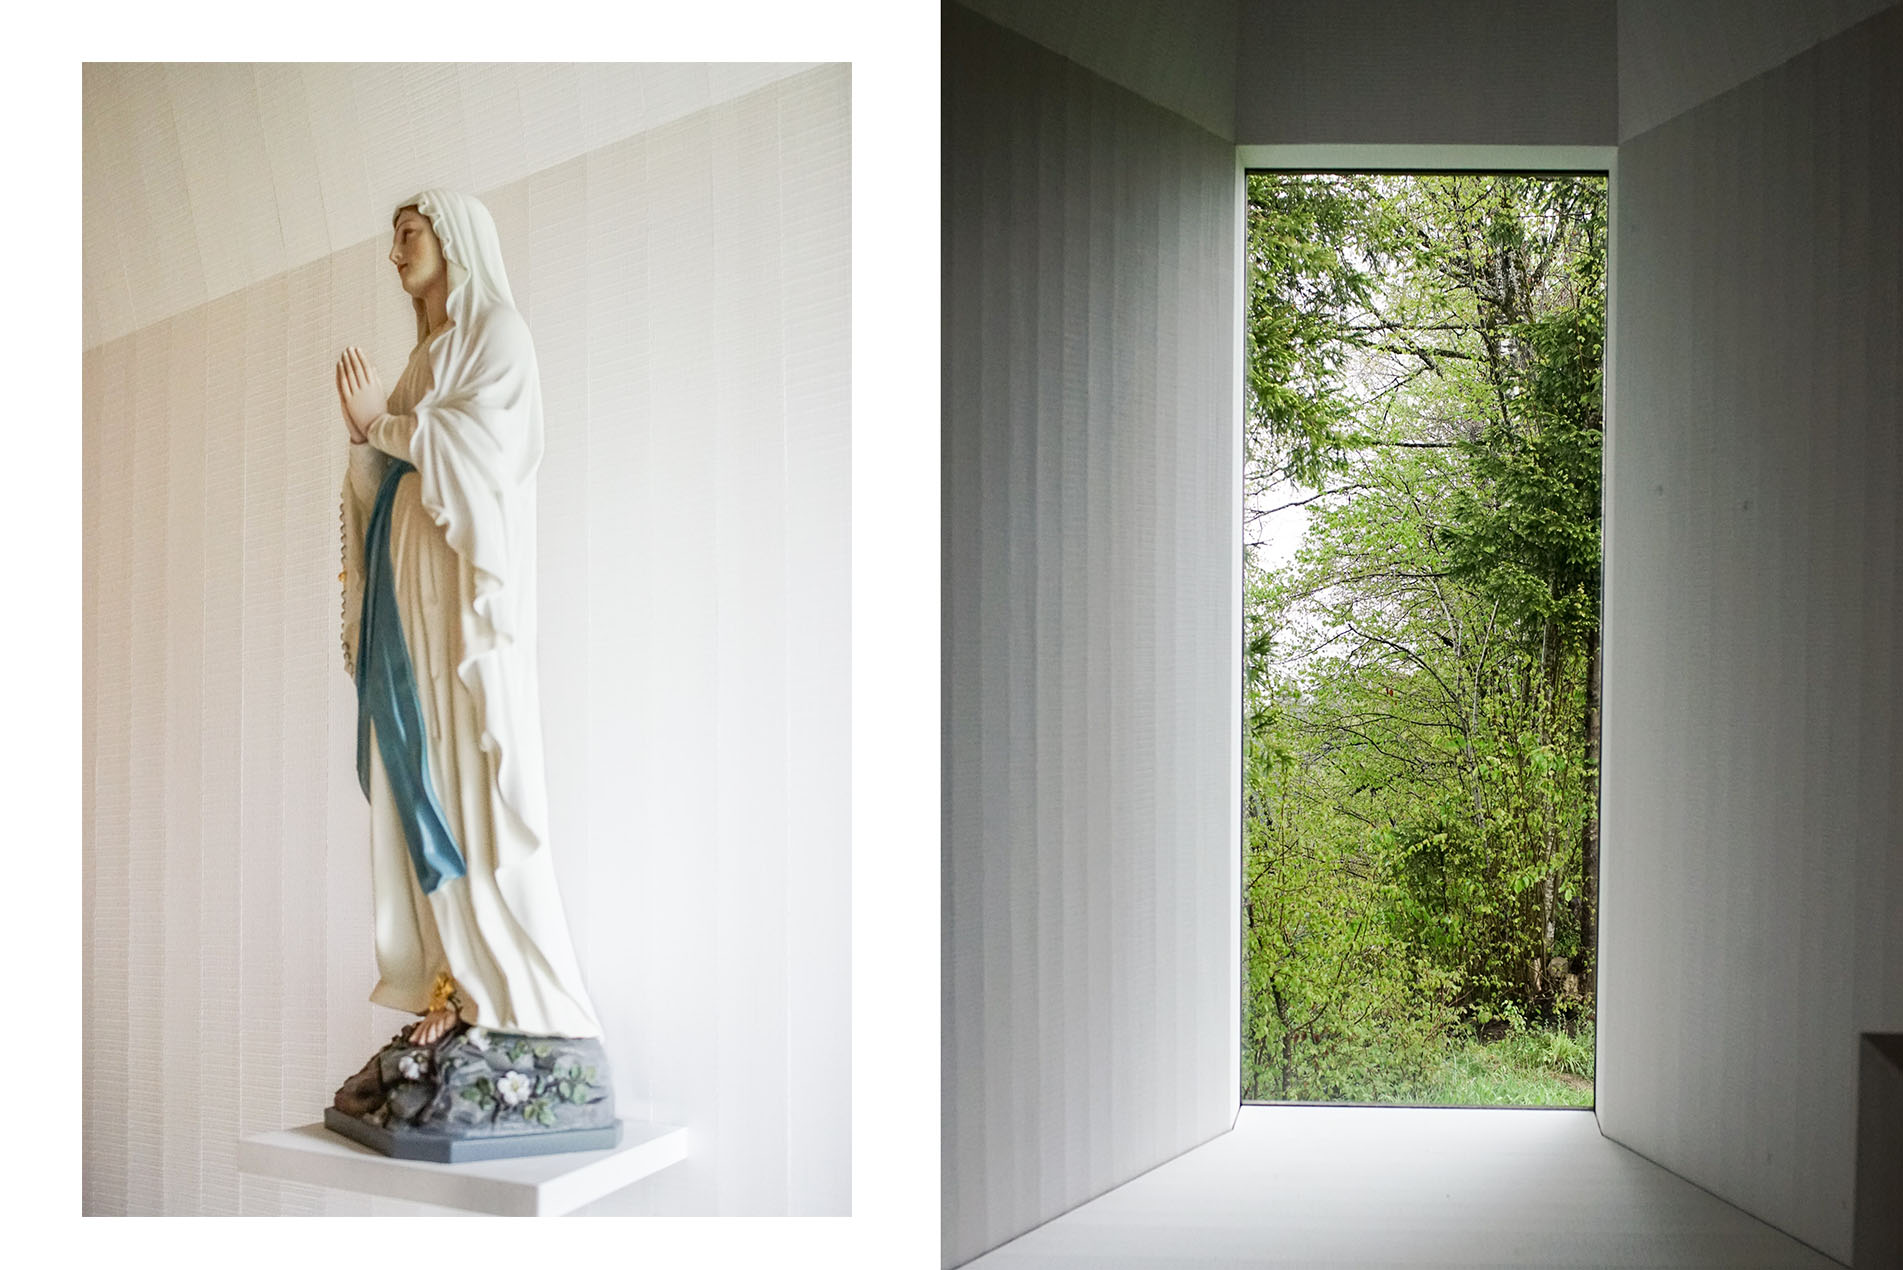 salgenreute-chapel-bernardo-bader-photo-jean-nicolas-lechat-urbantyper-interieur